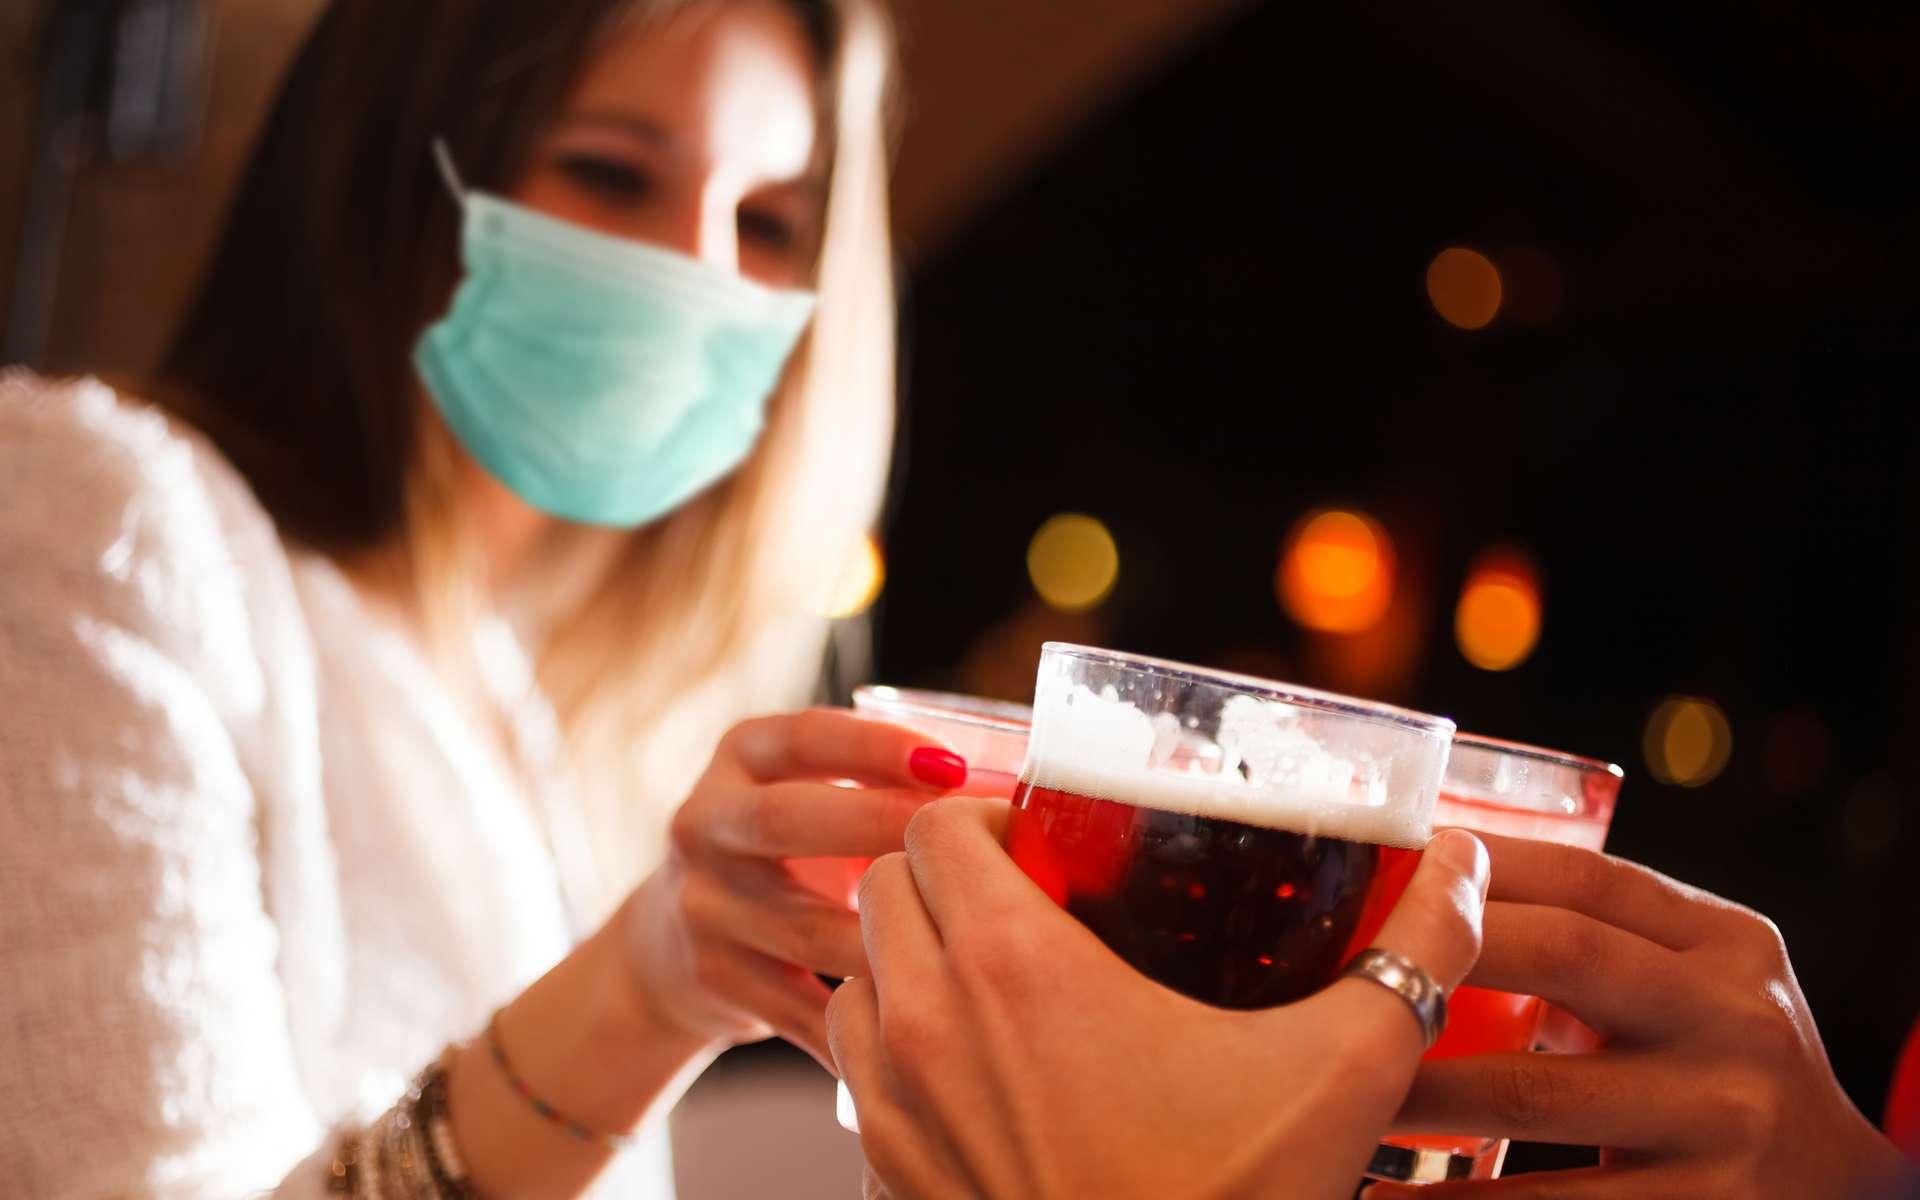 L'alcool aggrave la maladie et accroît le risque de transmission © Minerva Studio, Adobe Stock